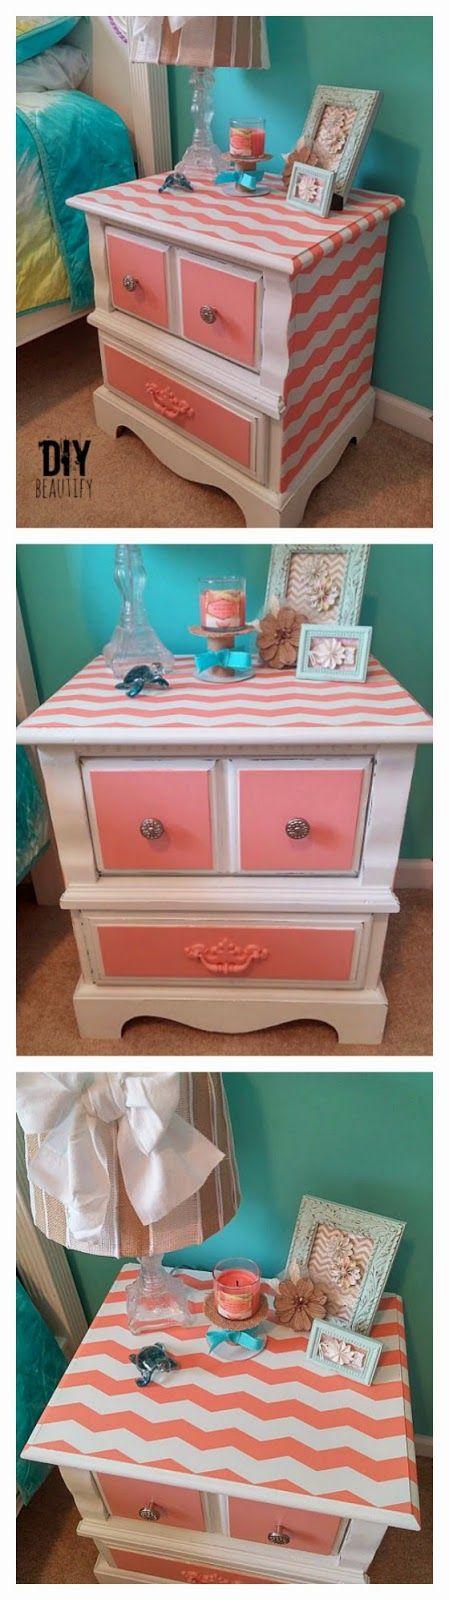 Chevron Stripes on nightstand www.diybeautify.com #frogtape #chevron #chalkpaint